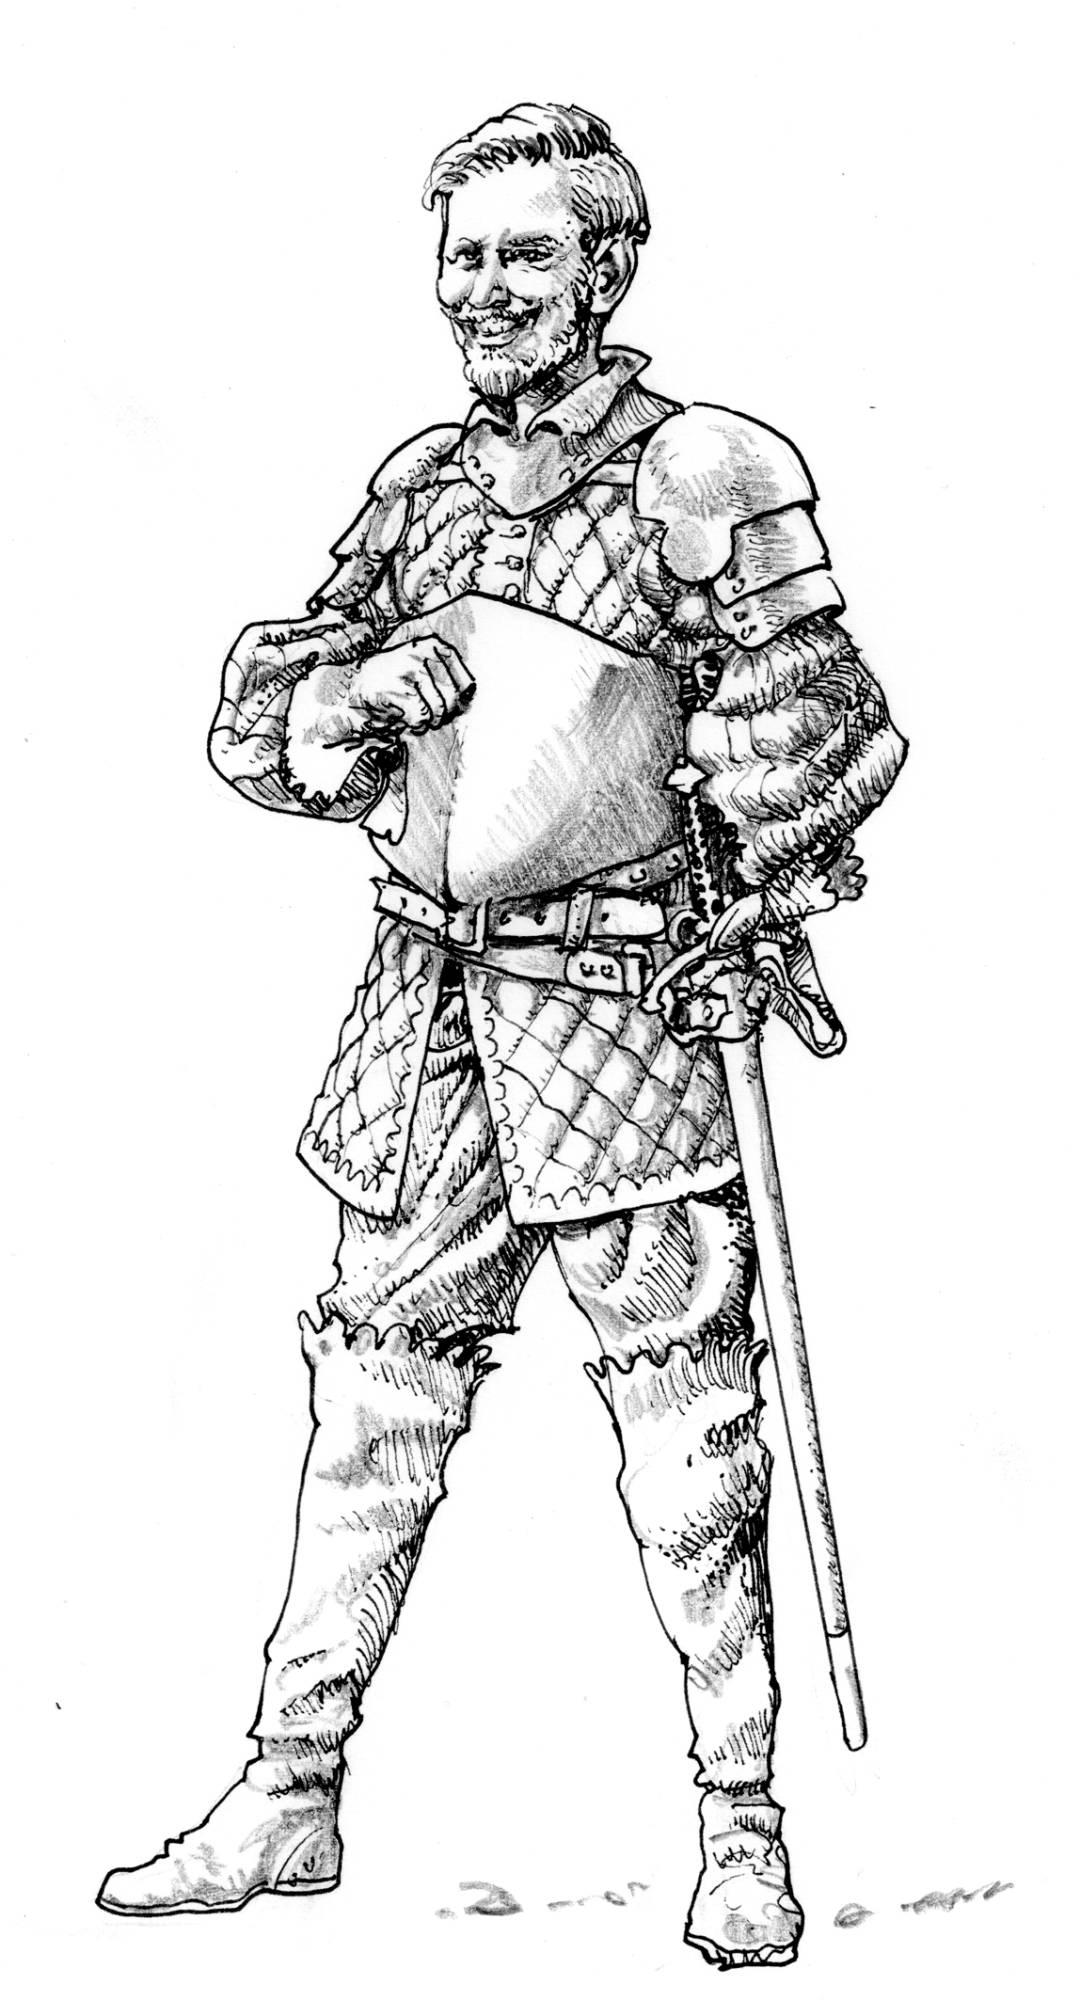 Wastburg, Personnage de Roland Barthelemy © les XII Singes